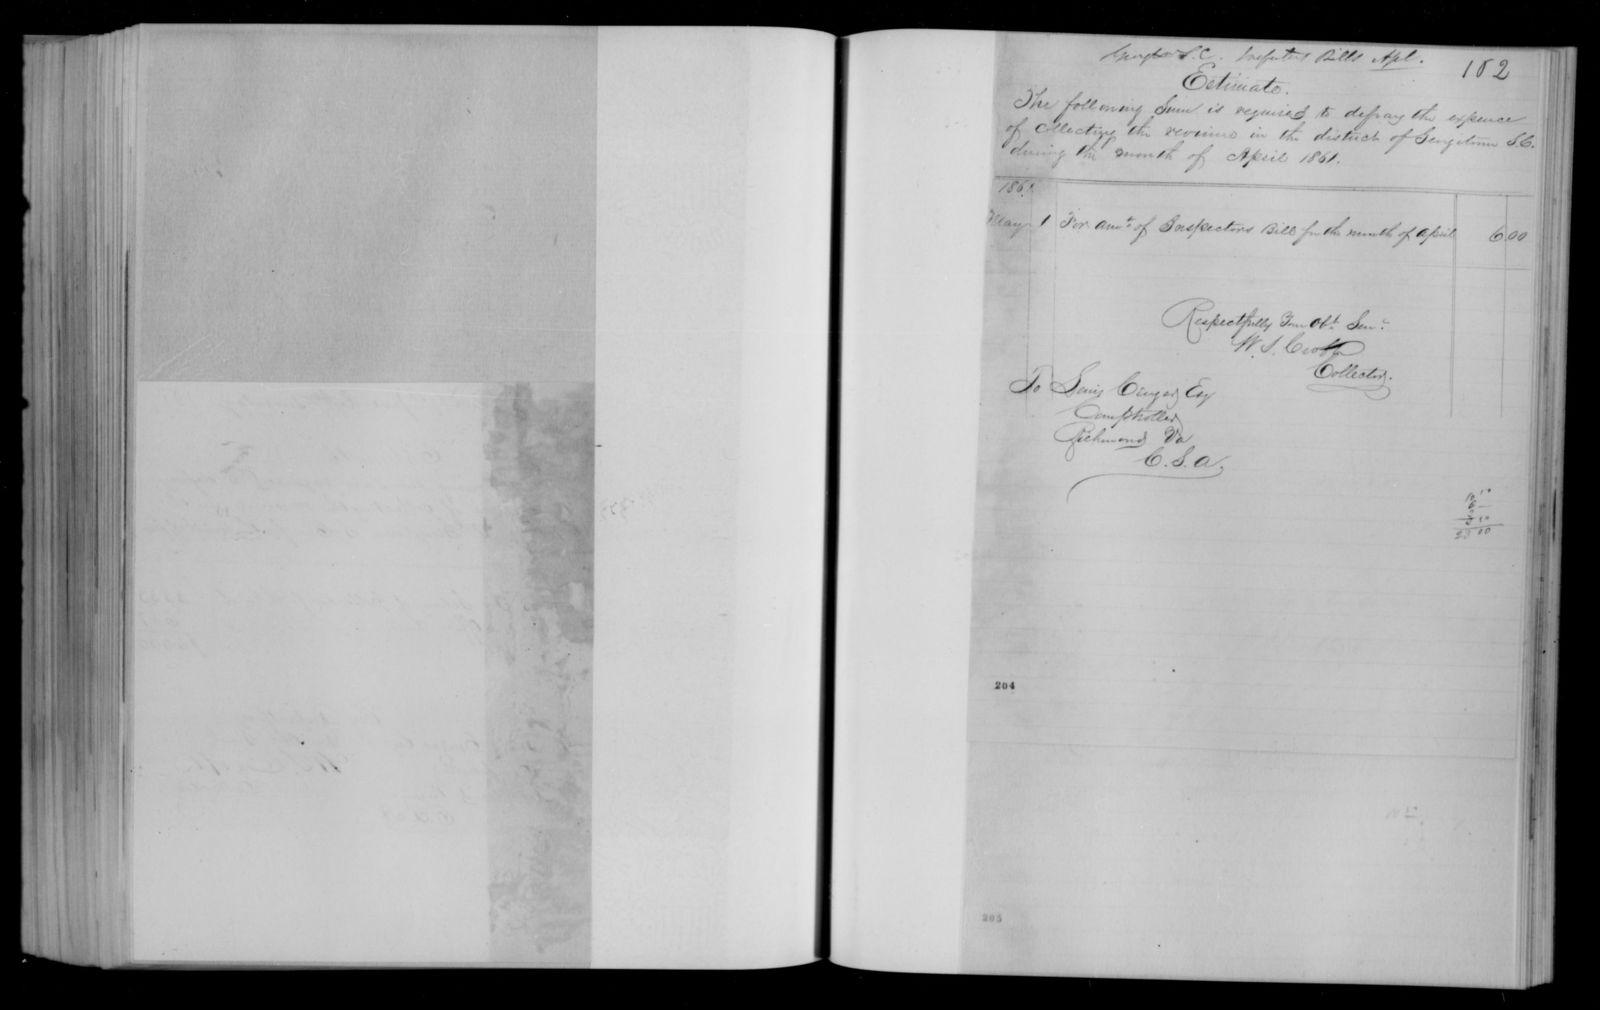 Confederate States of America records: Microfilm Reel 48